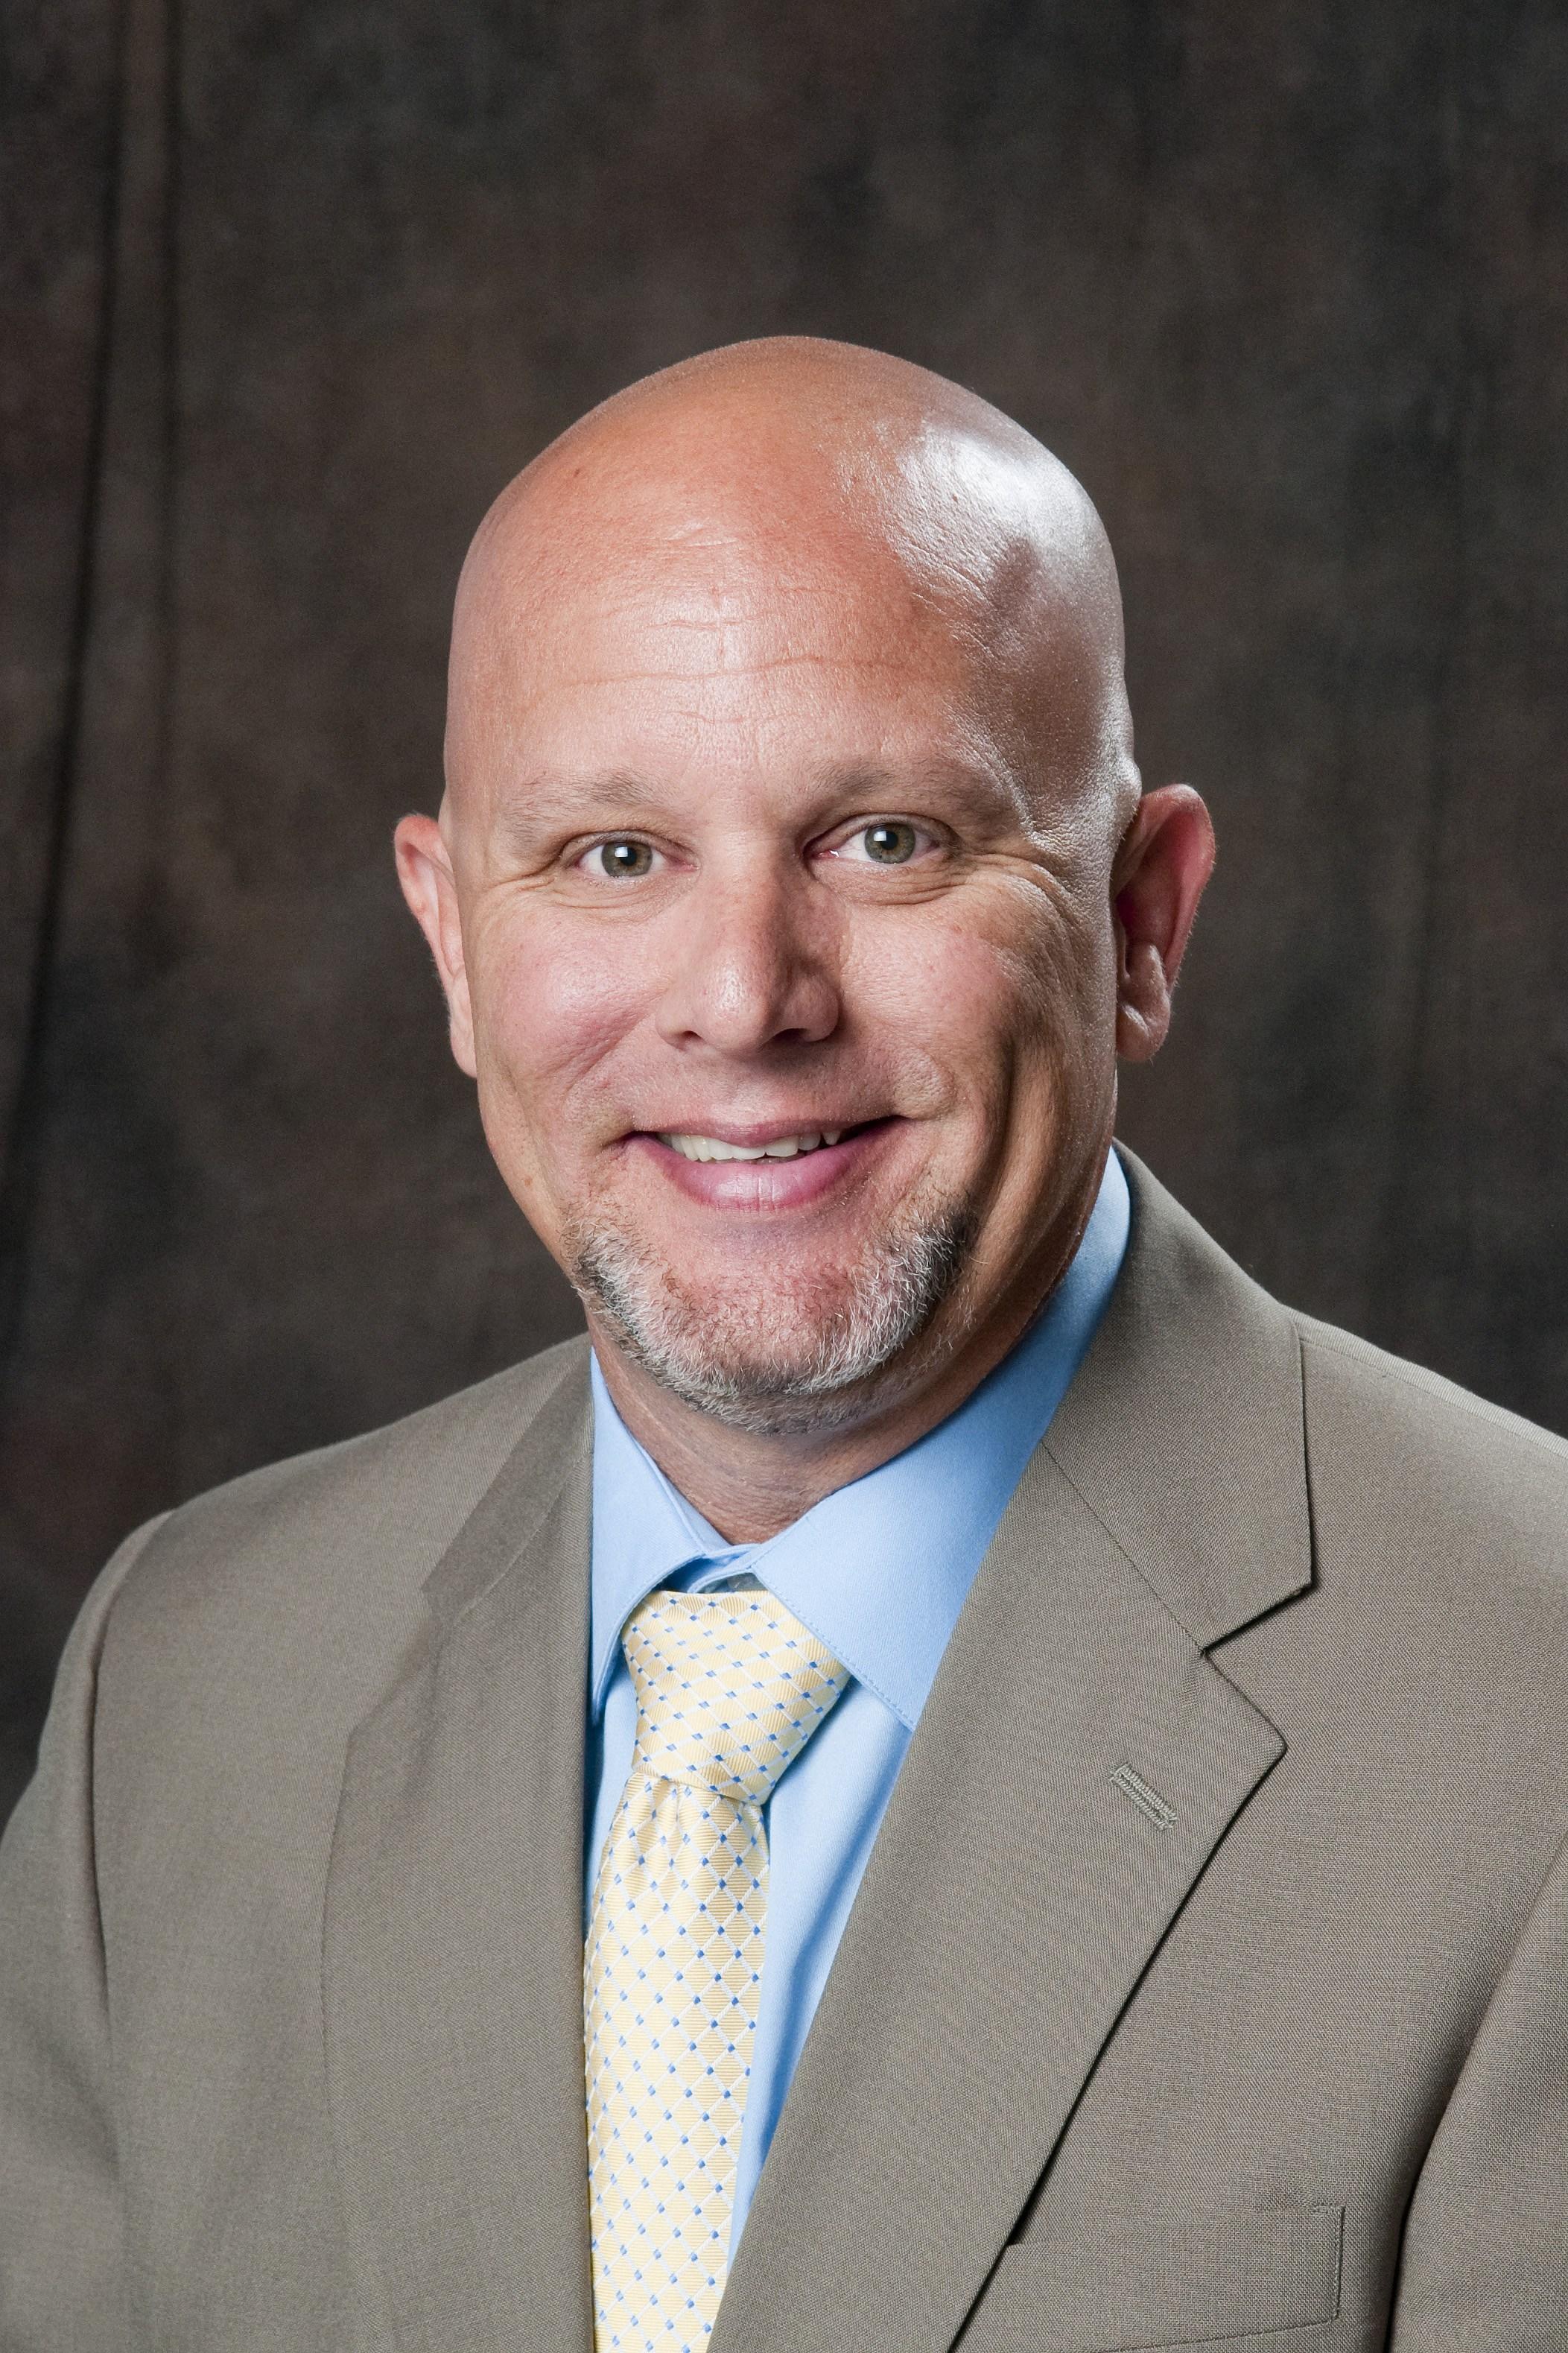 Kevin Daw, Principal of S.L. Mason